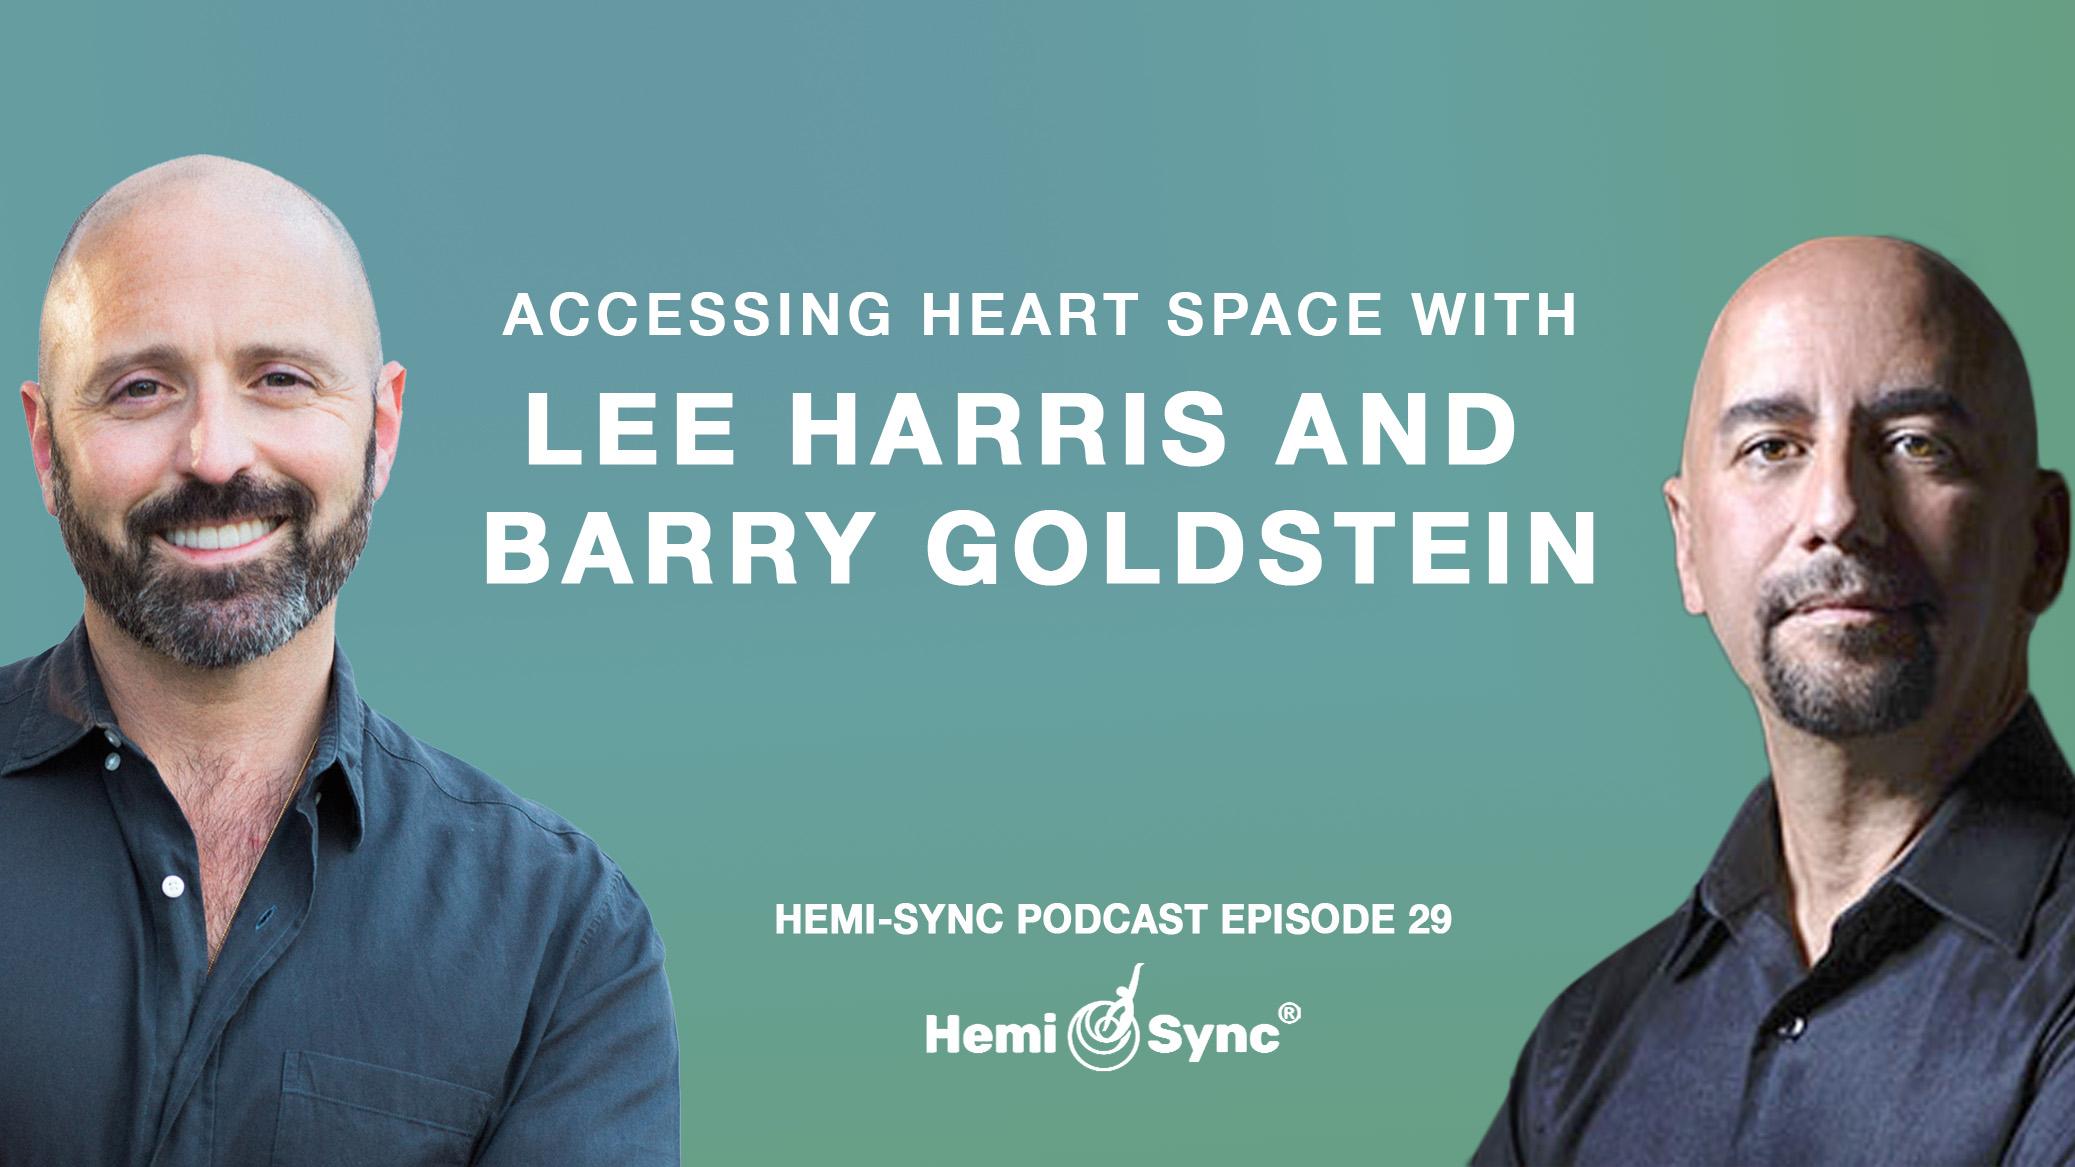 Hemi_Sync_Lee Harris and Barry Goldstein_Ep29